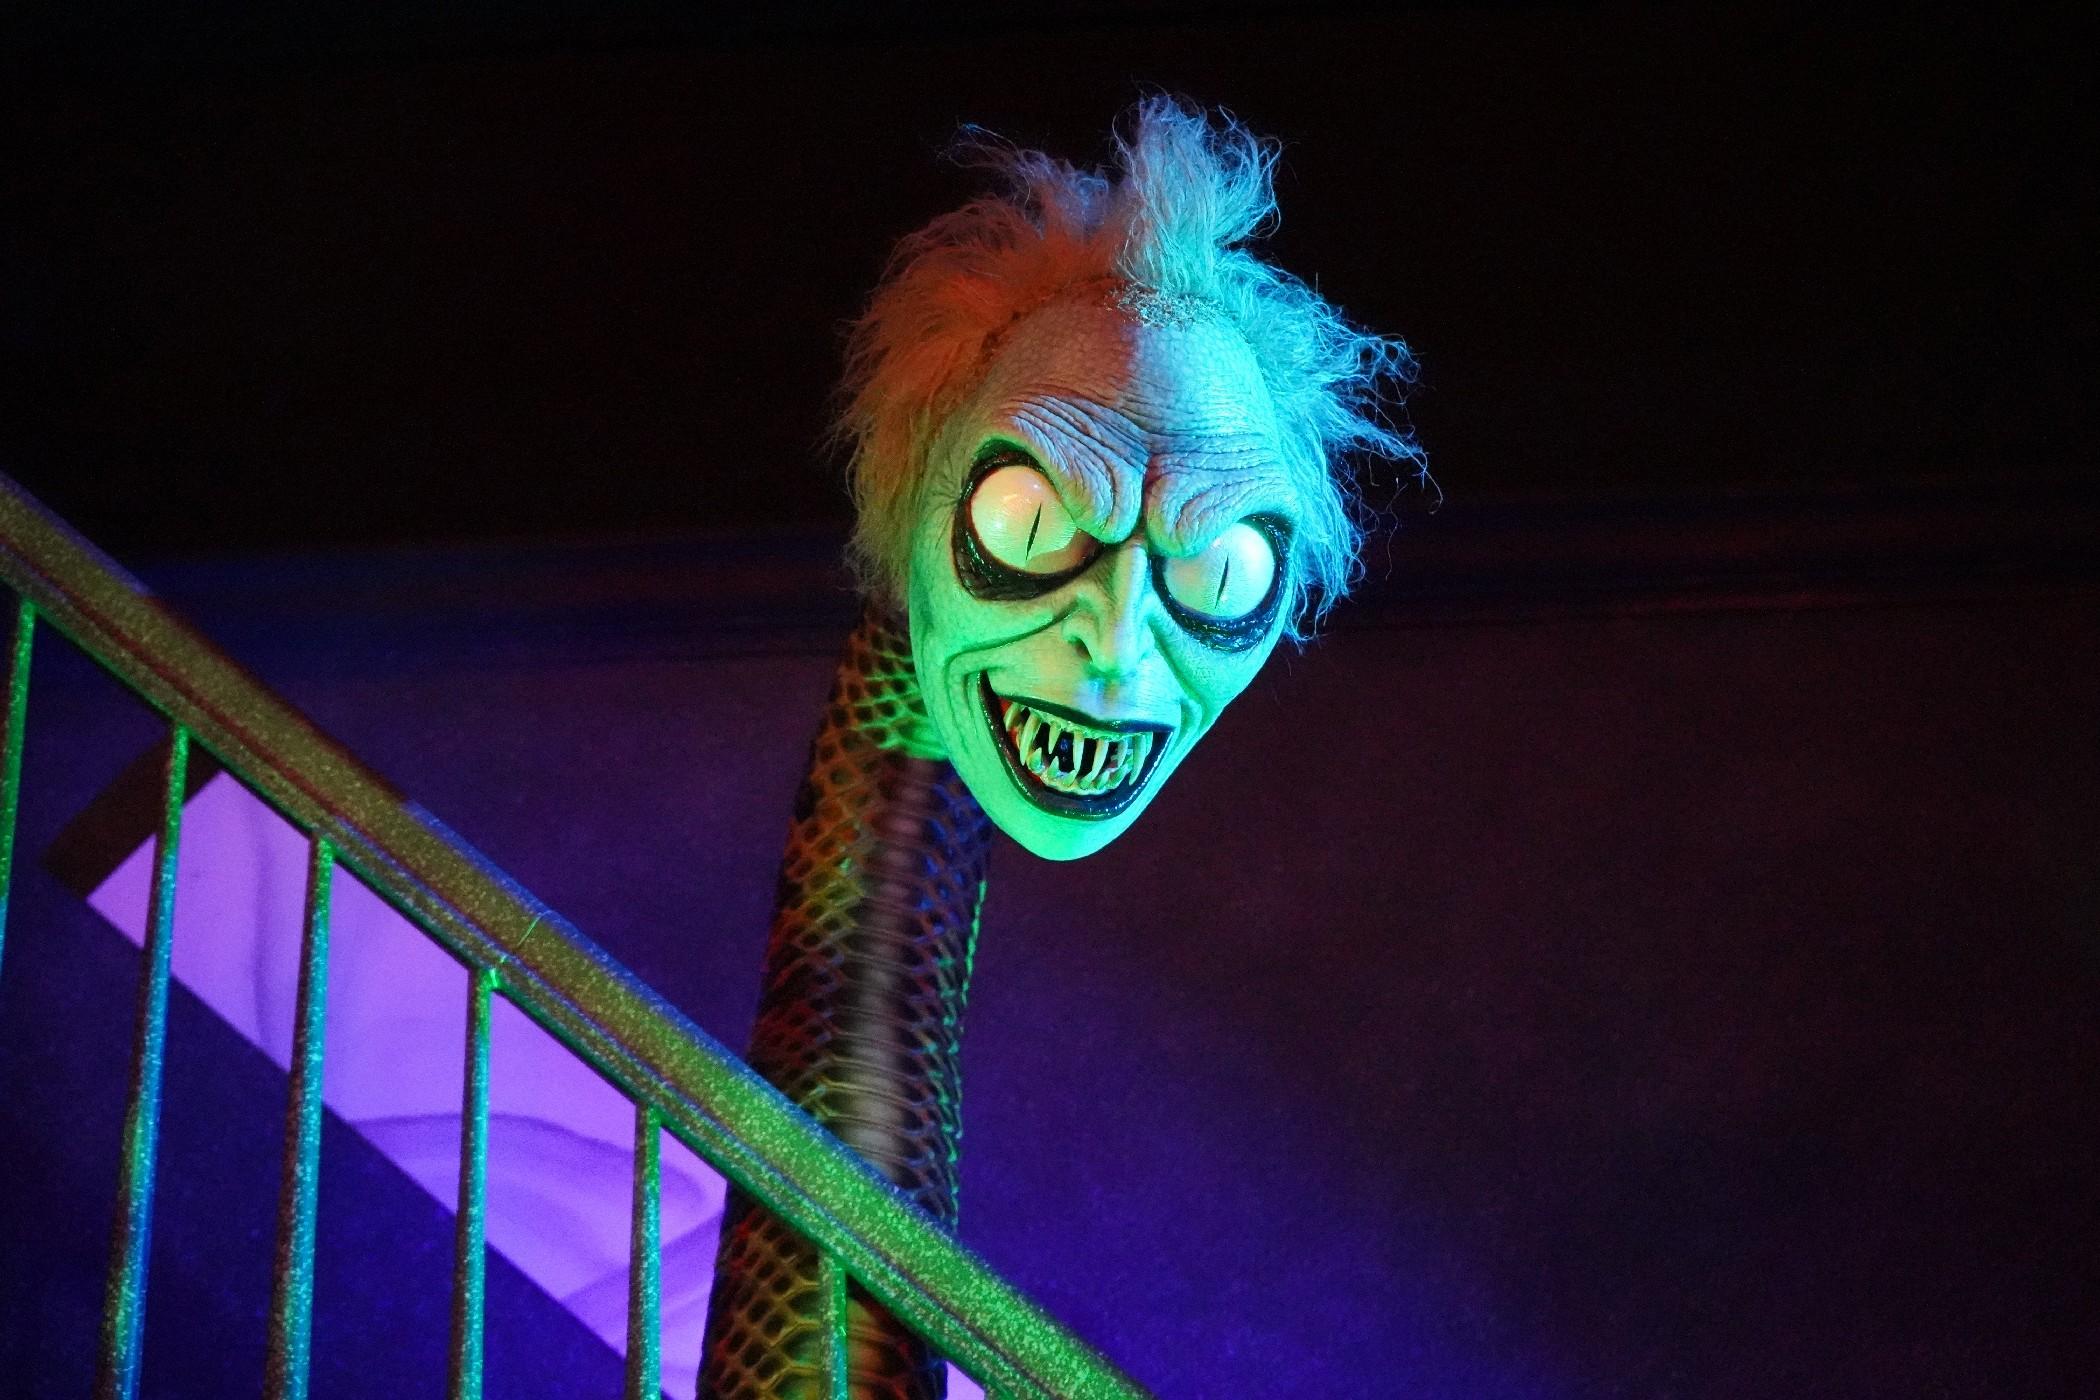 Halloween Horror Nights 20 2020 Beetlejuice theme room opens at Halloween Horror Nights Tribute